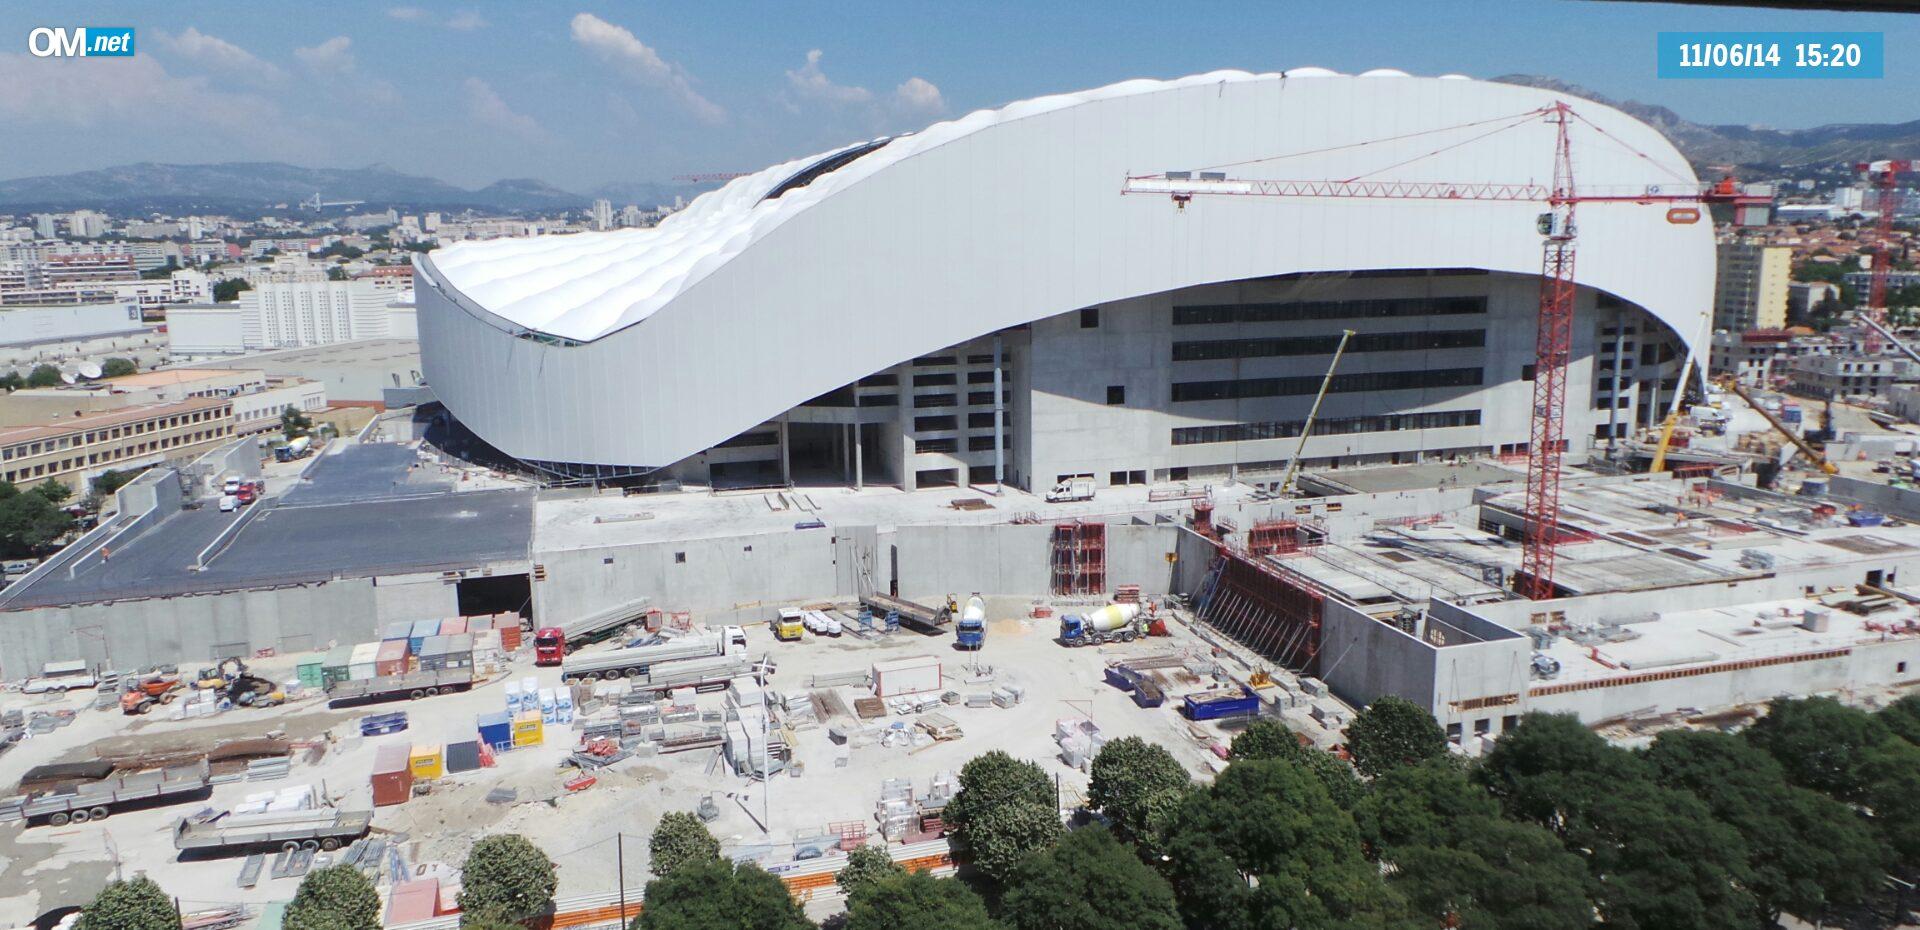 Marseille stade v lodrome 67 394 page 97 for Porte 7 stade velodrome